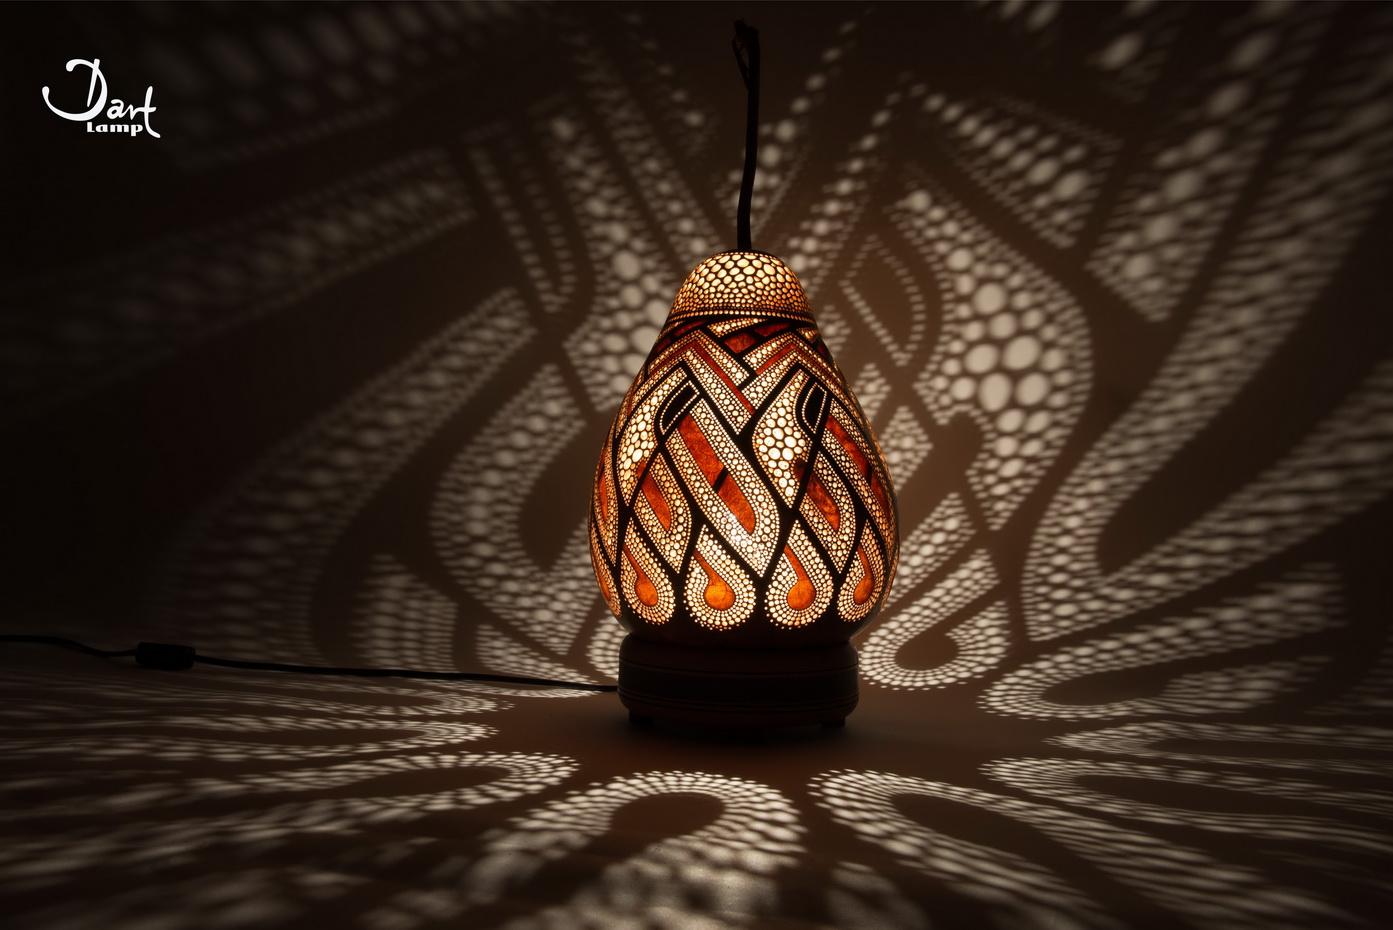 Dart Lamp No36